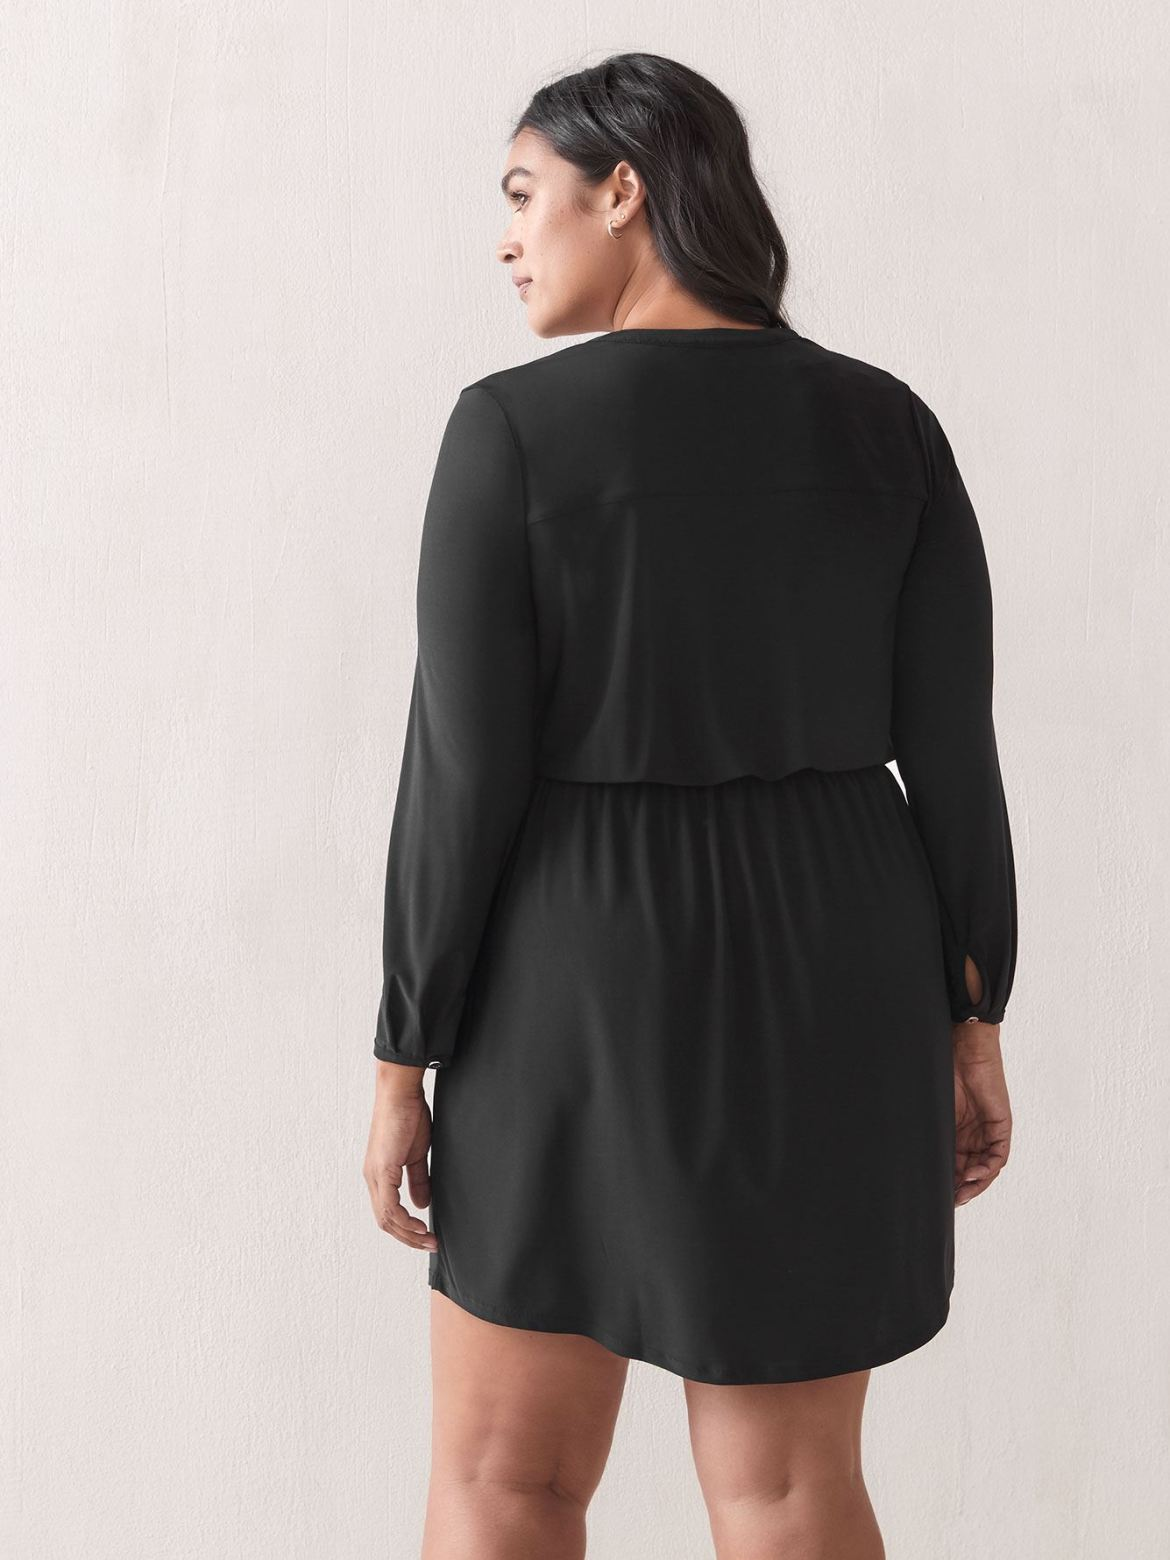 Long-Sleeve Shirt Dress - Addition Elle